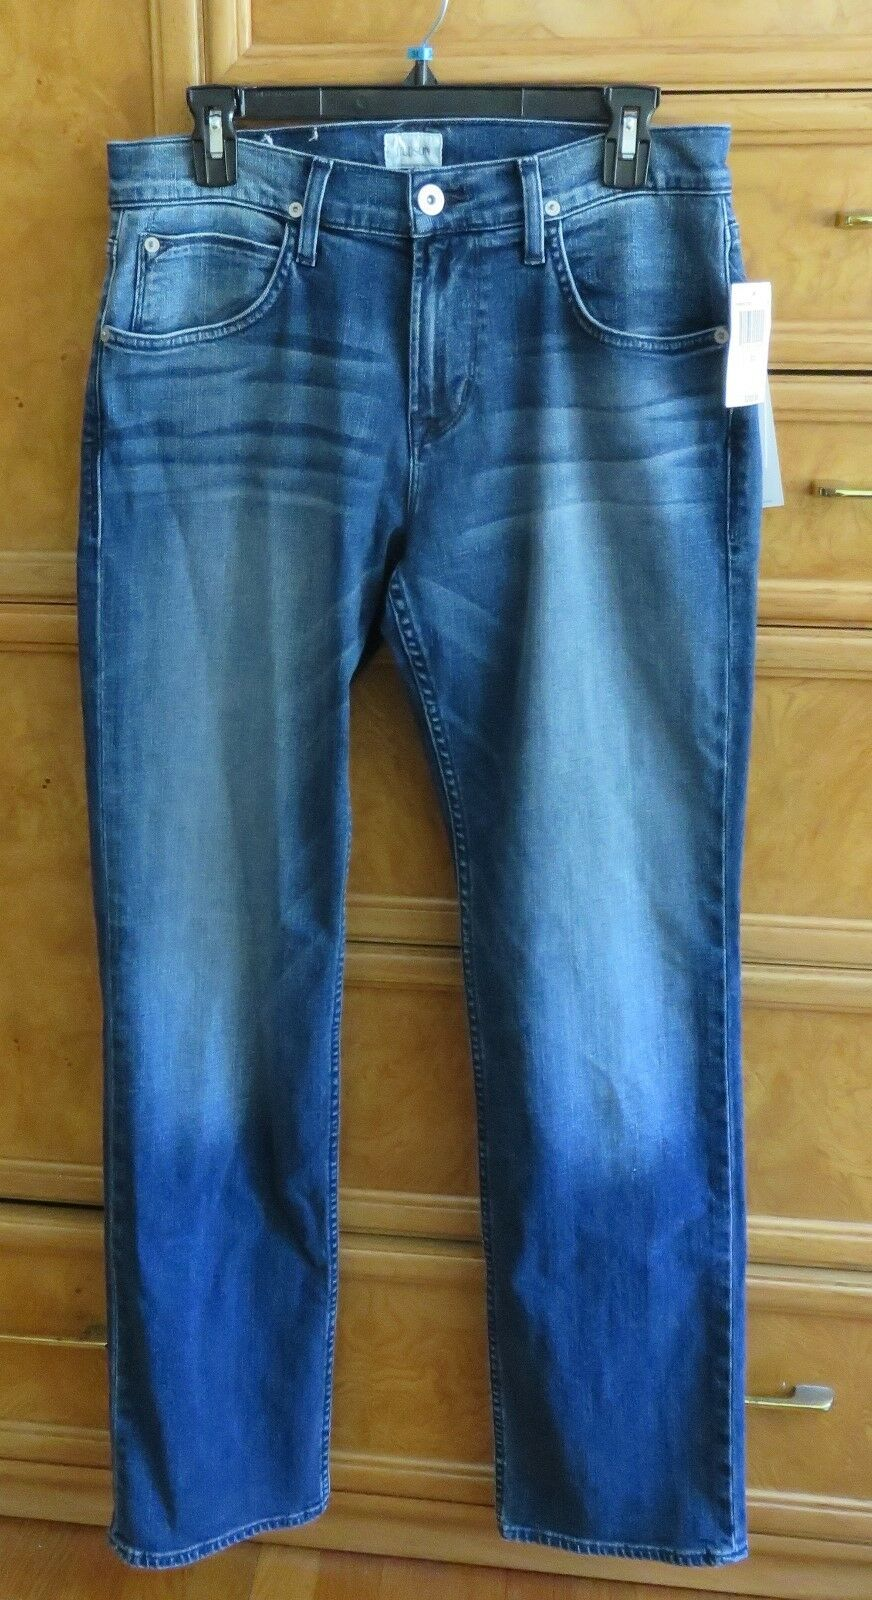 Men's Hudson wilde straight leg relaxed bluee jeans size 30x33 brand new NWT